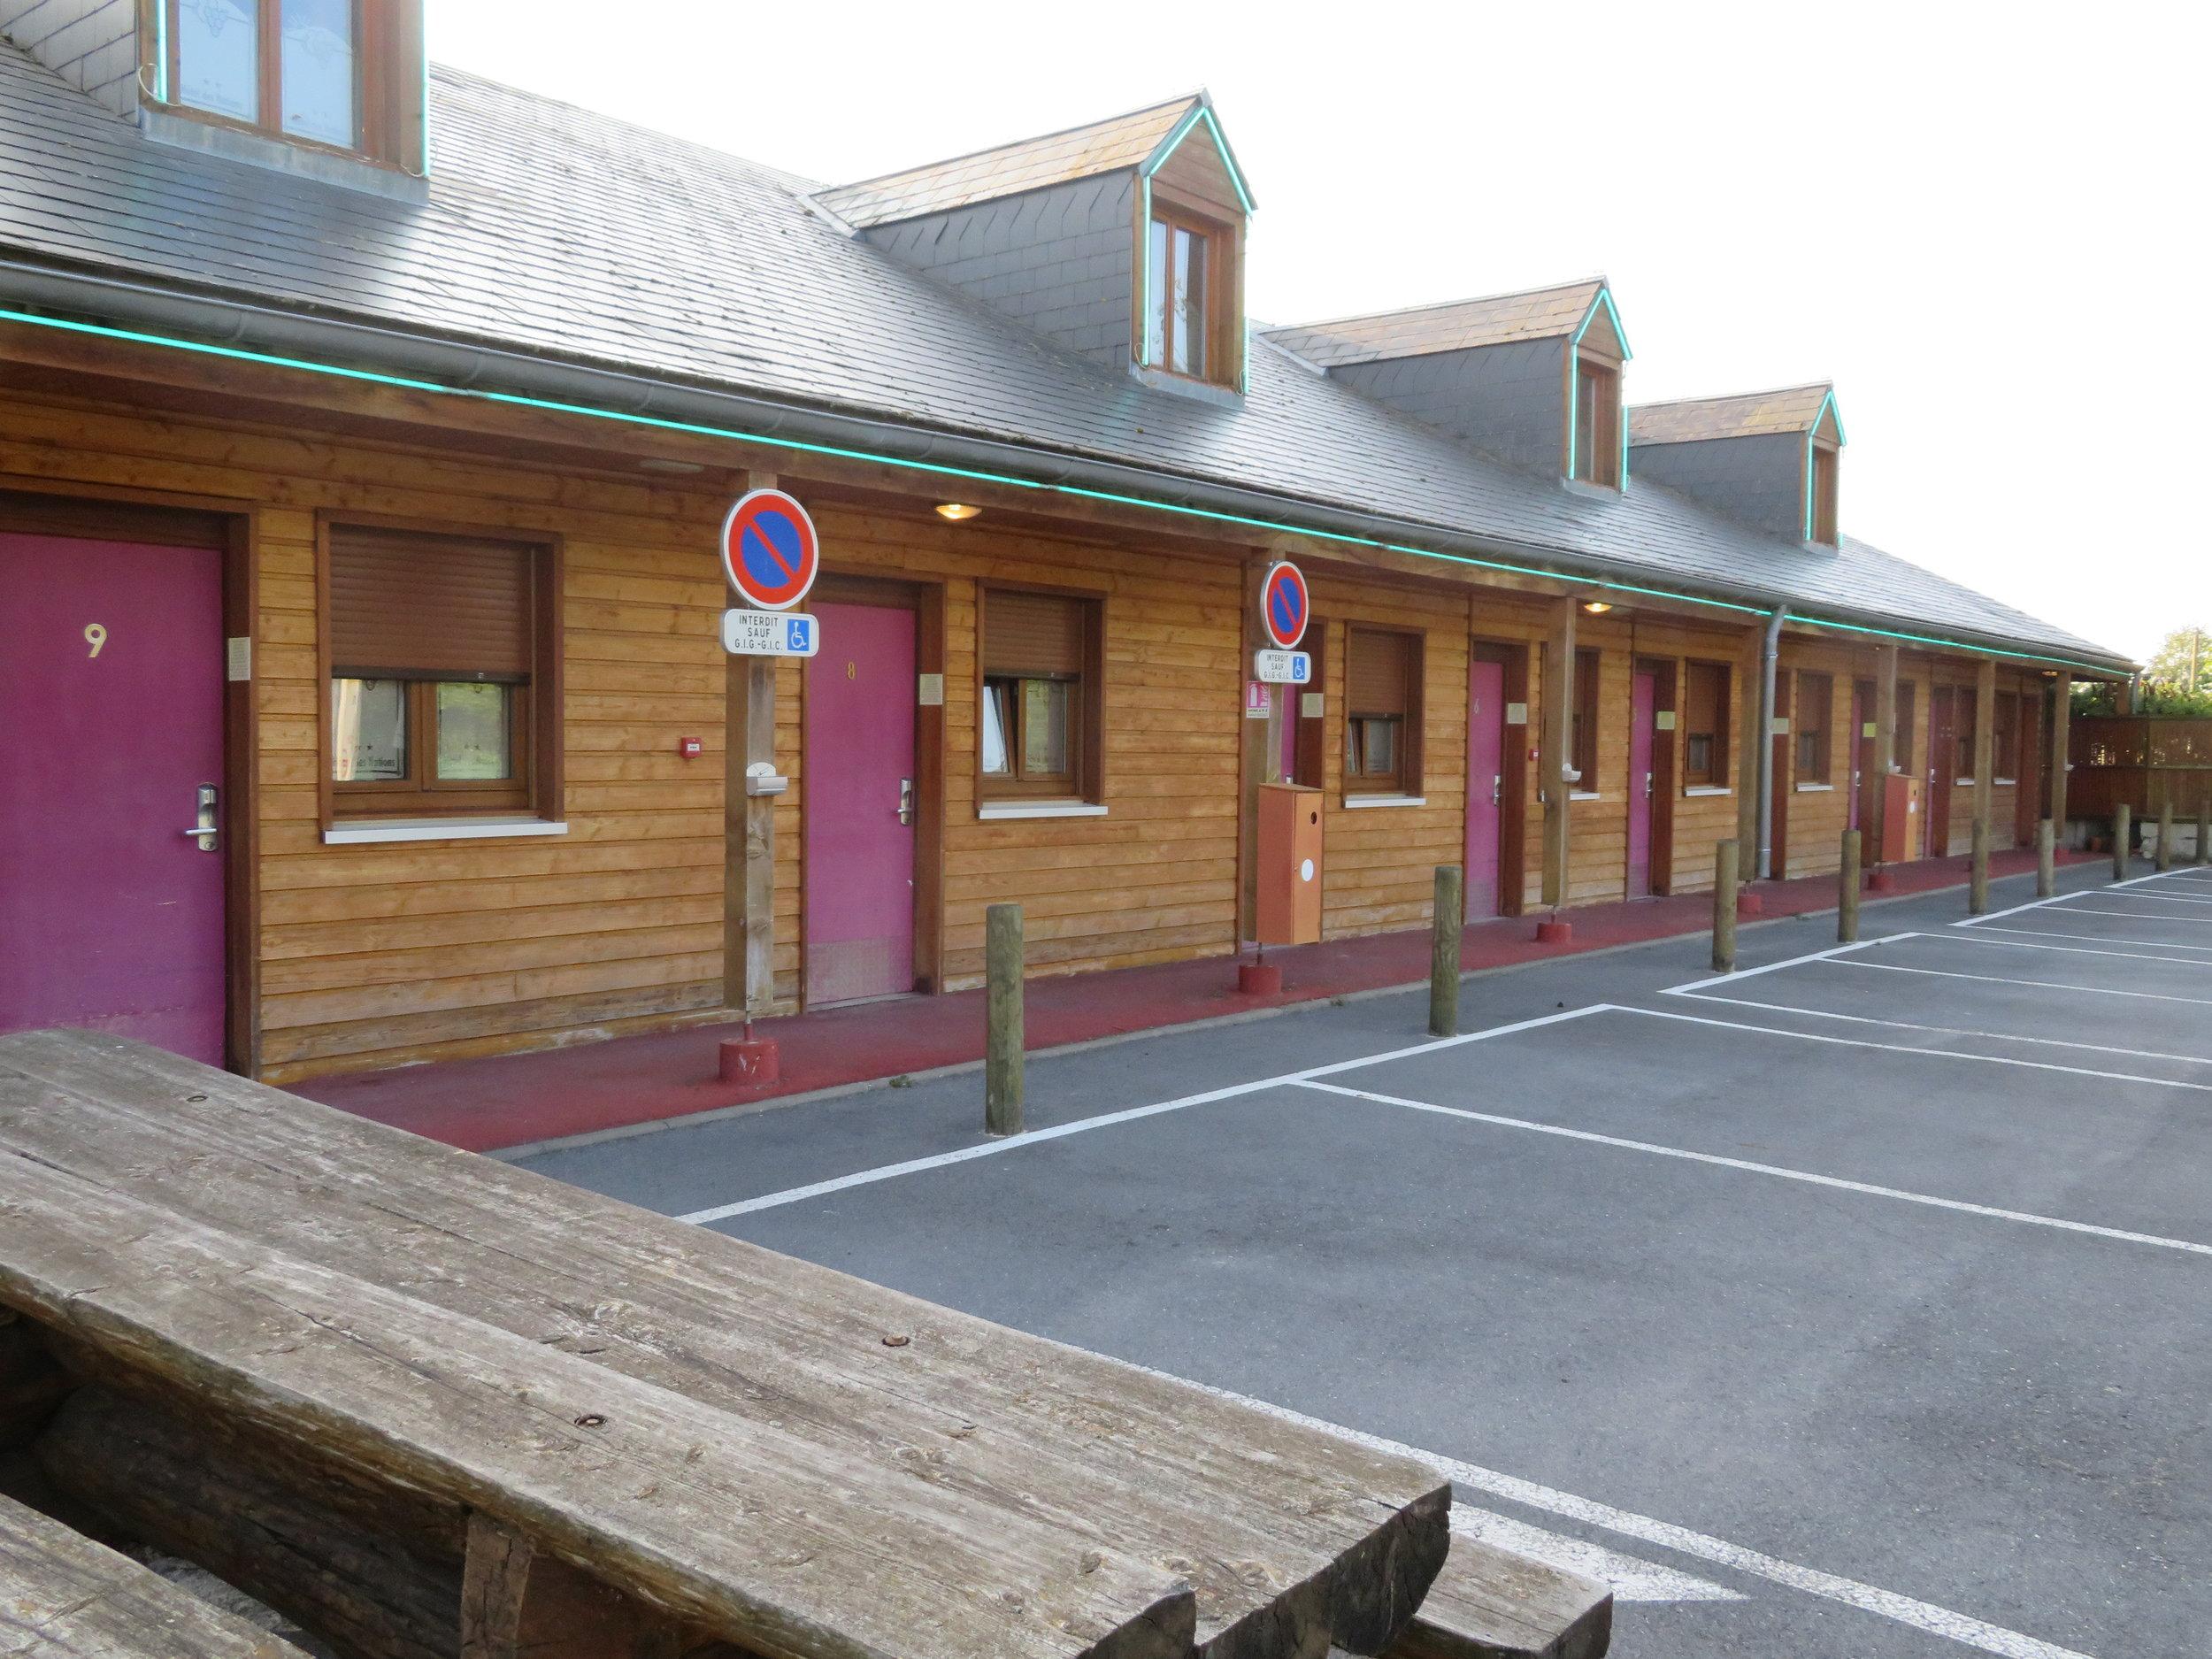 Hotel (MOTEL) des Nations - less than impressive